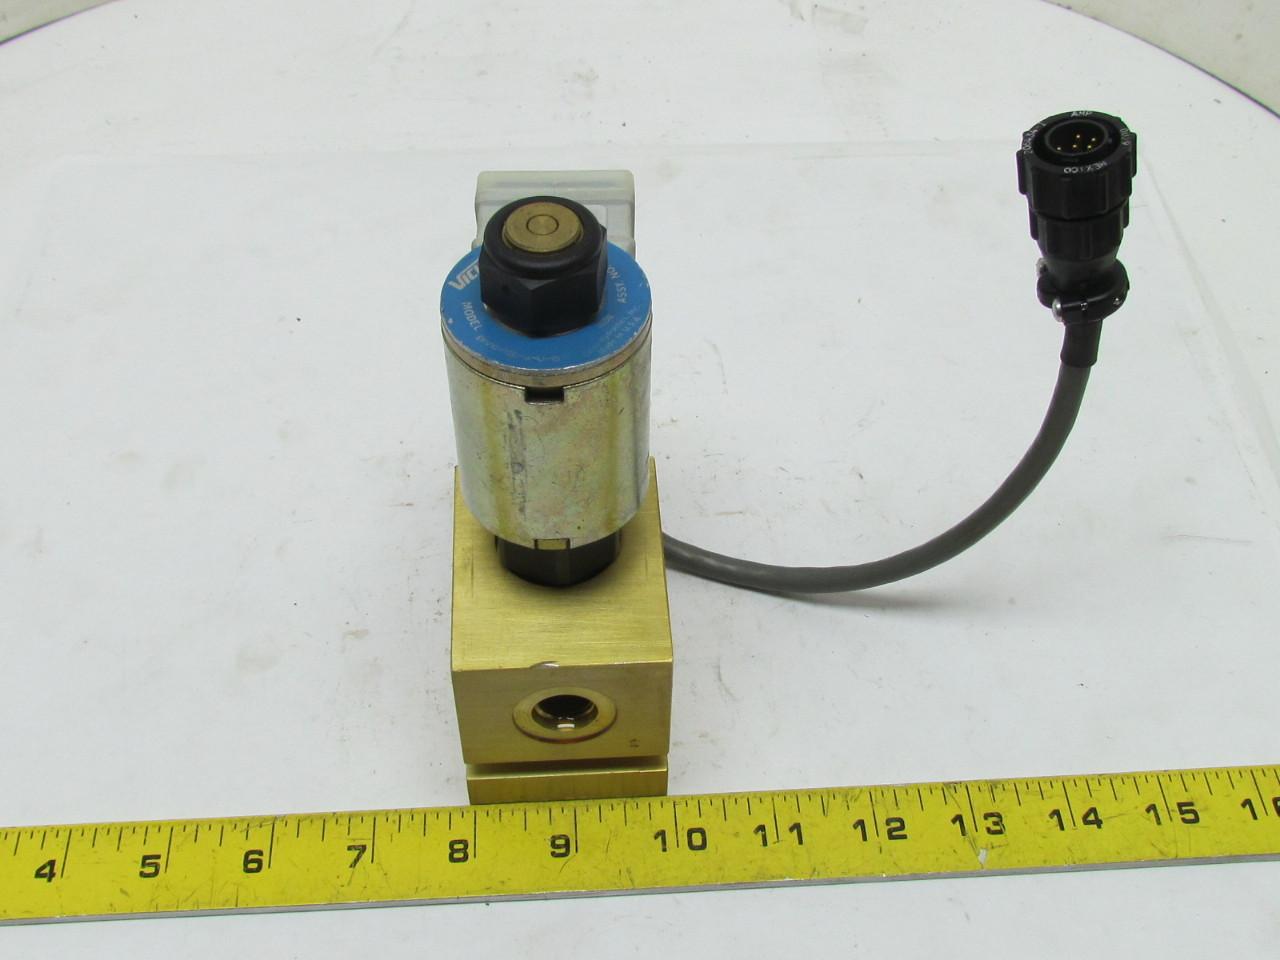 Vickers EPV10-12D-M-U-10 23035 Hydraulic Flow Control Valve w/Plug 12VDC Coil